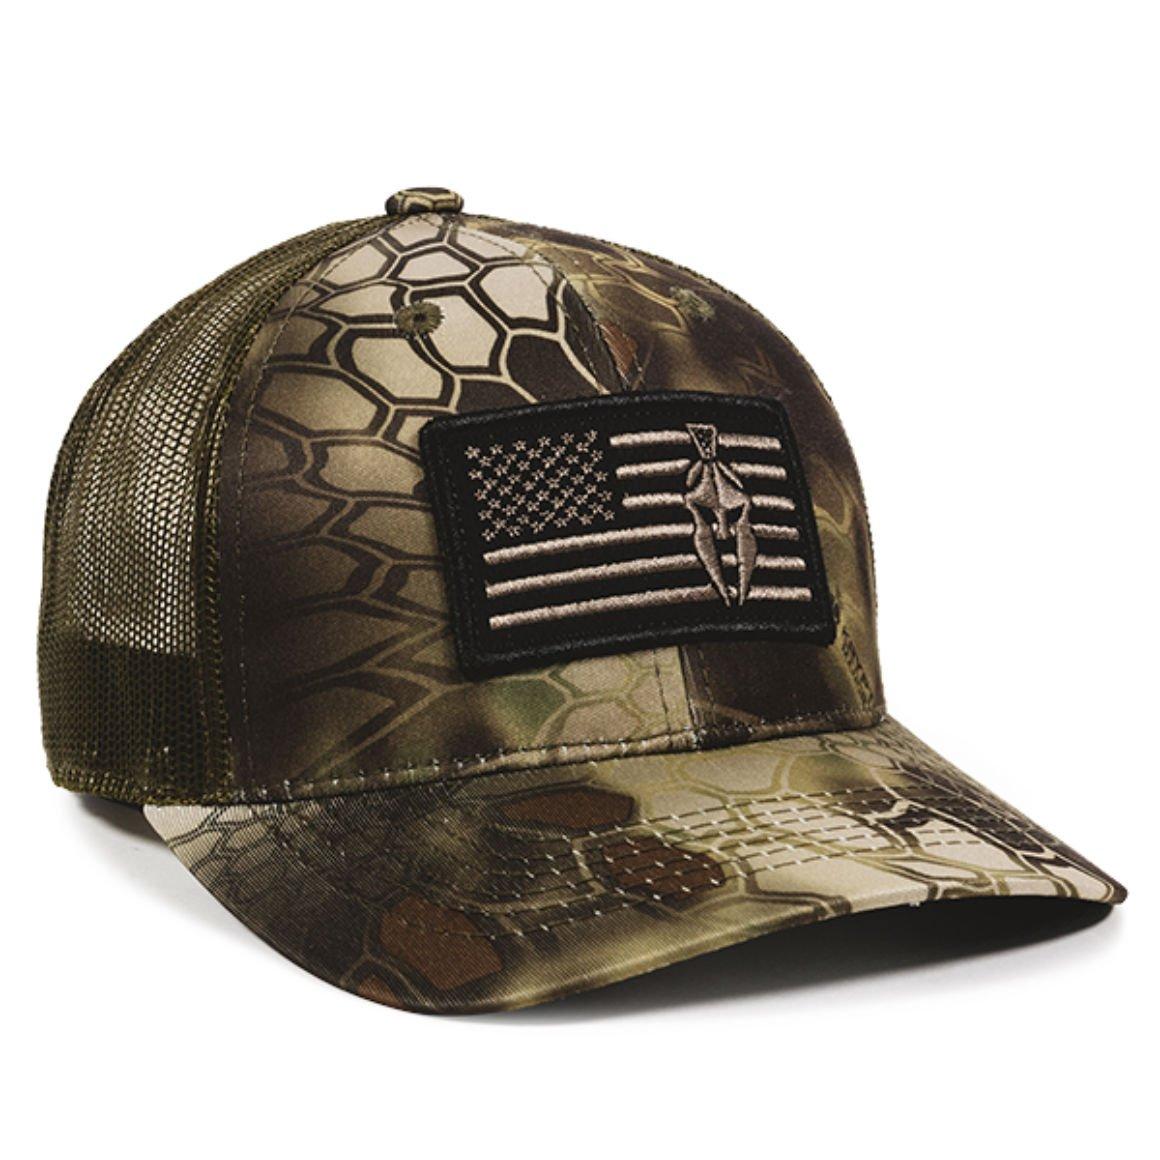 Kryptek Mandrake USA Flag Patch Mesh Back Fishing, Hunting, Military Cap